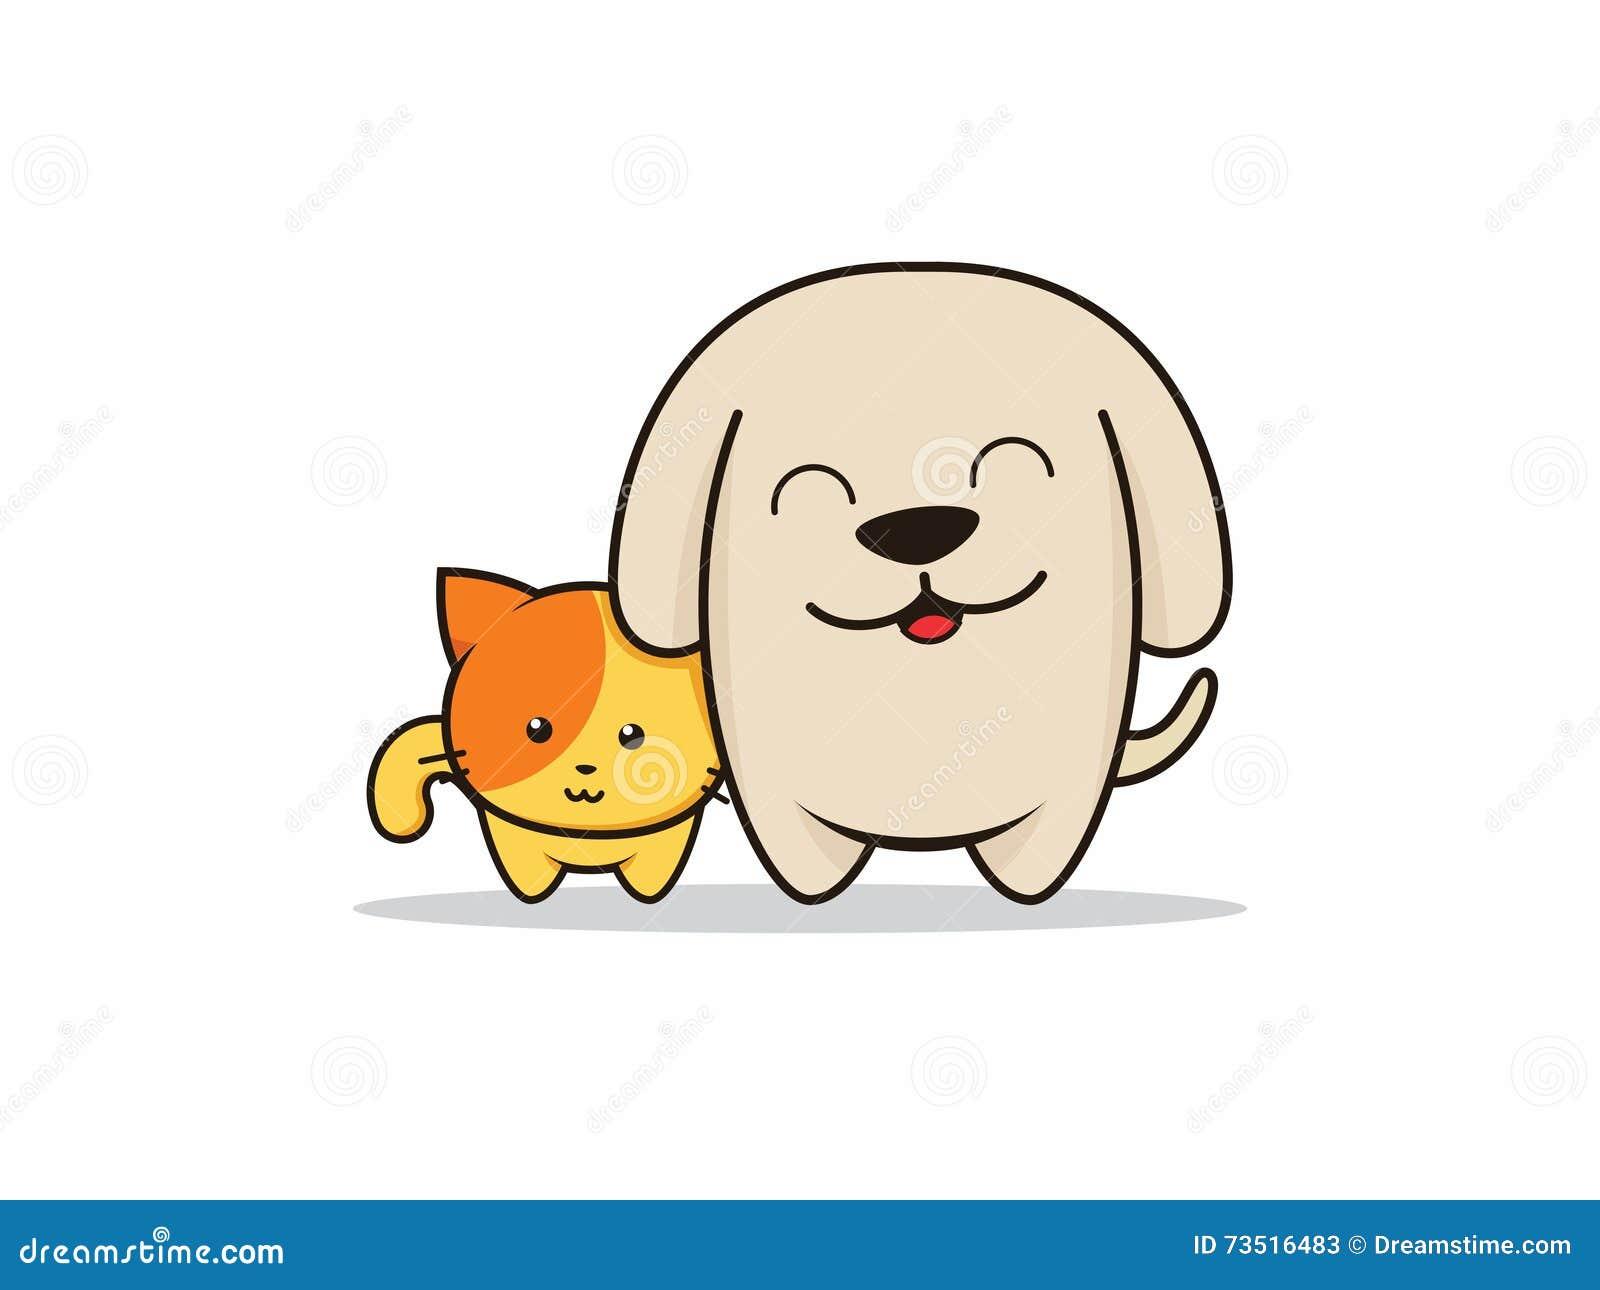 Dog And Cat Cartoon Illustrator Stock Vector Illustration Of Illustrator Character 73516483